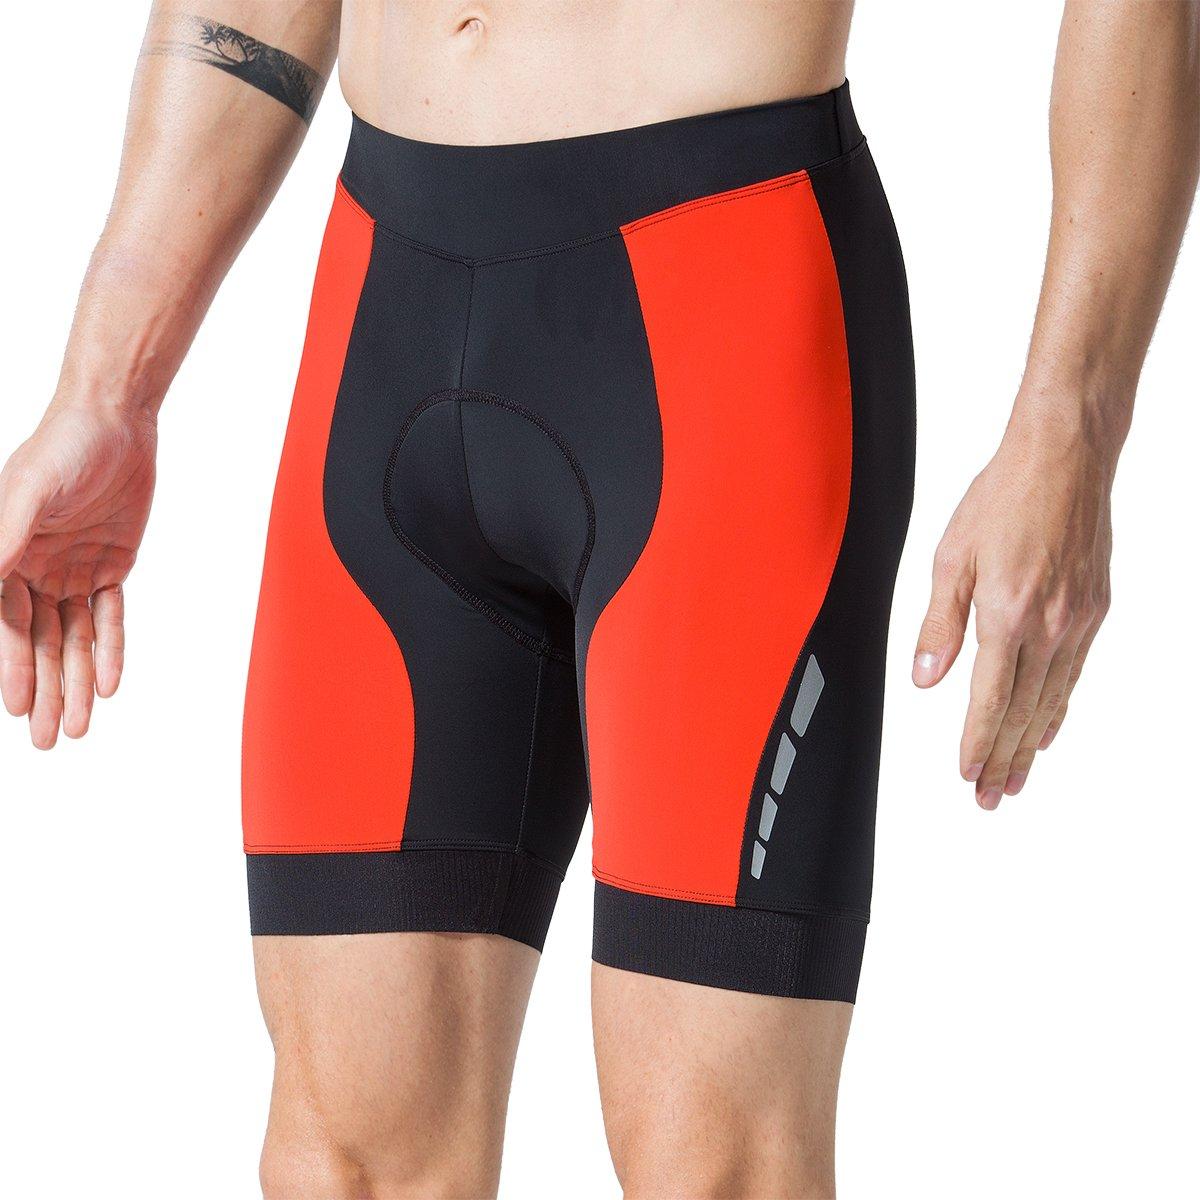 Eco-daily Men's Cycling Shorts Padded Bicycle Riding Half Pants Bike Biking Cycle Tights (1807-red, S)